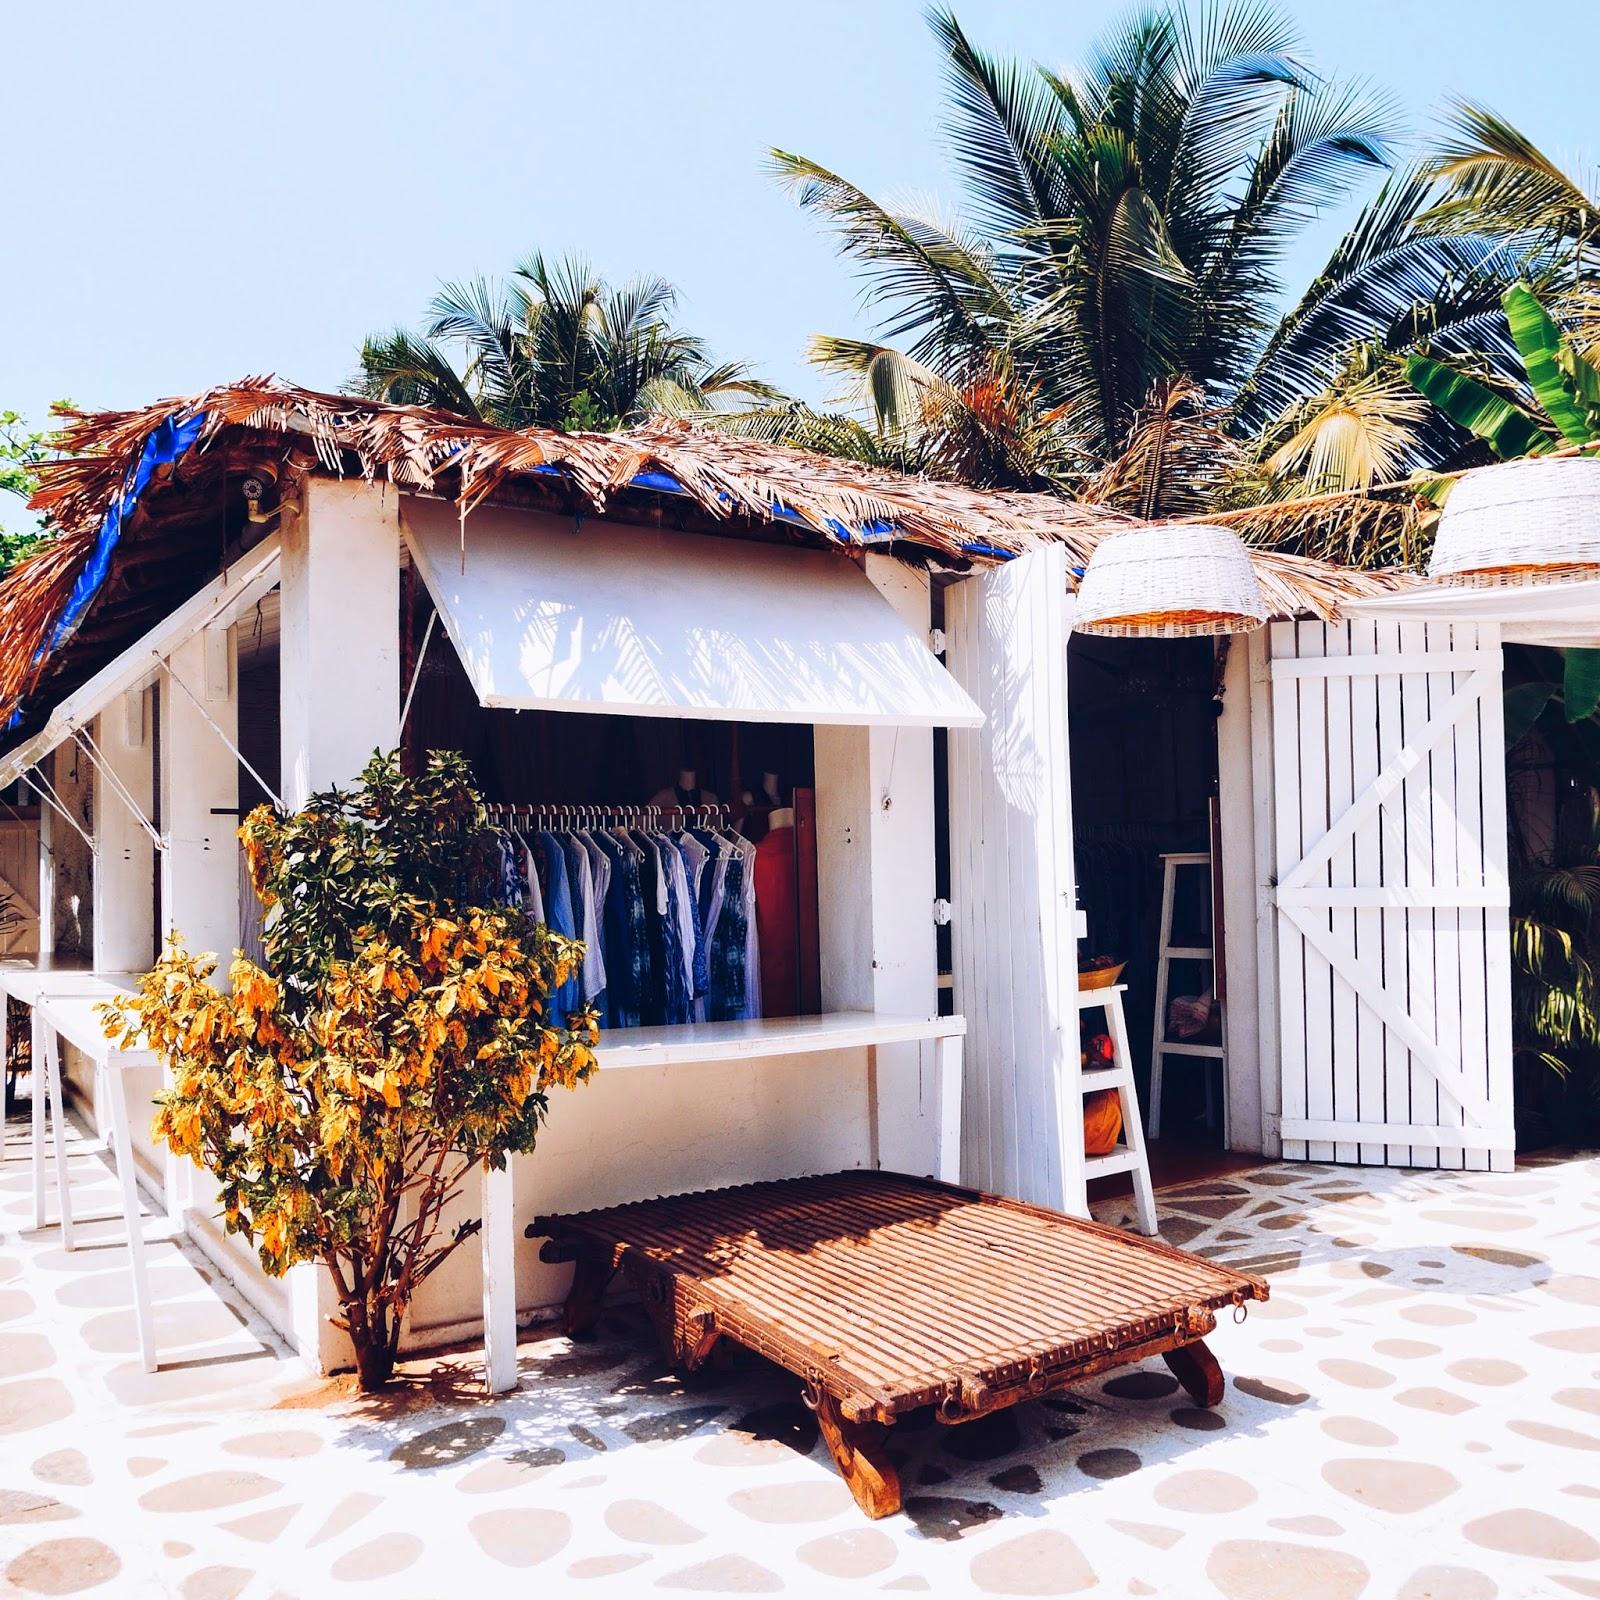 Thalassa Restaurant, Shop and Cabins